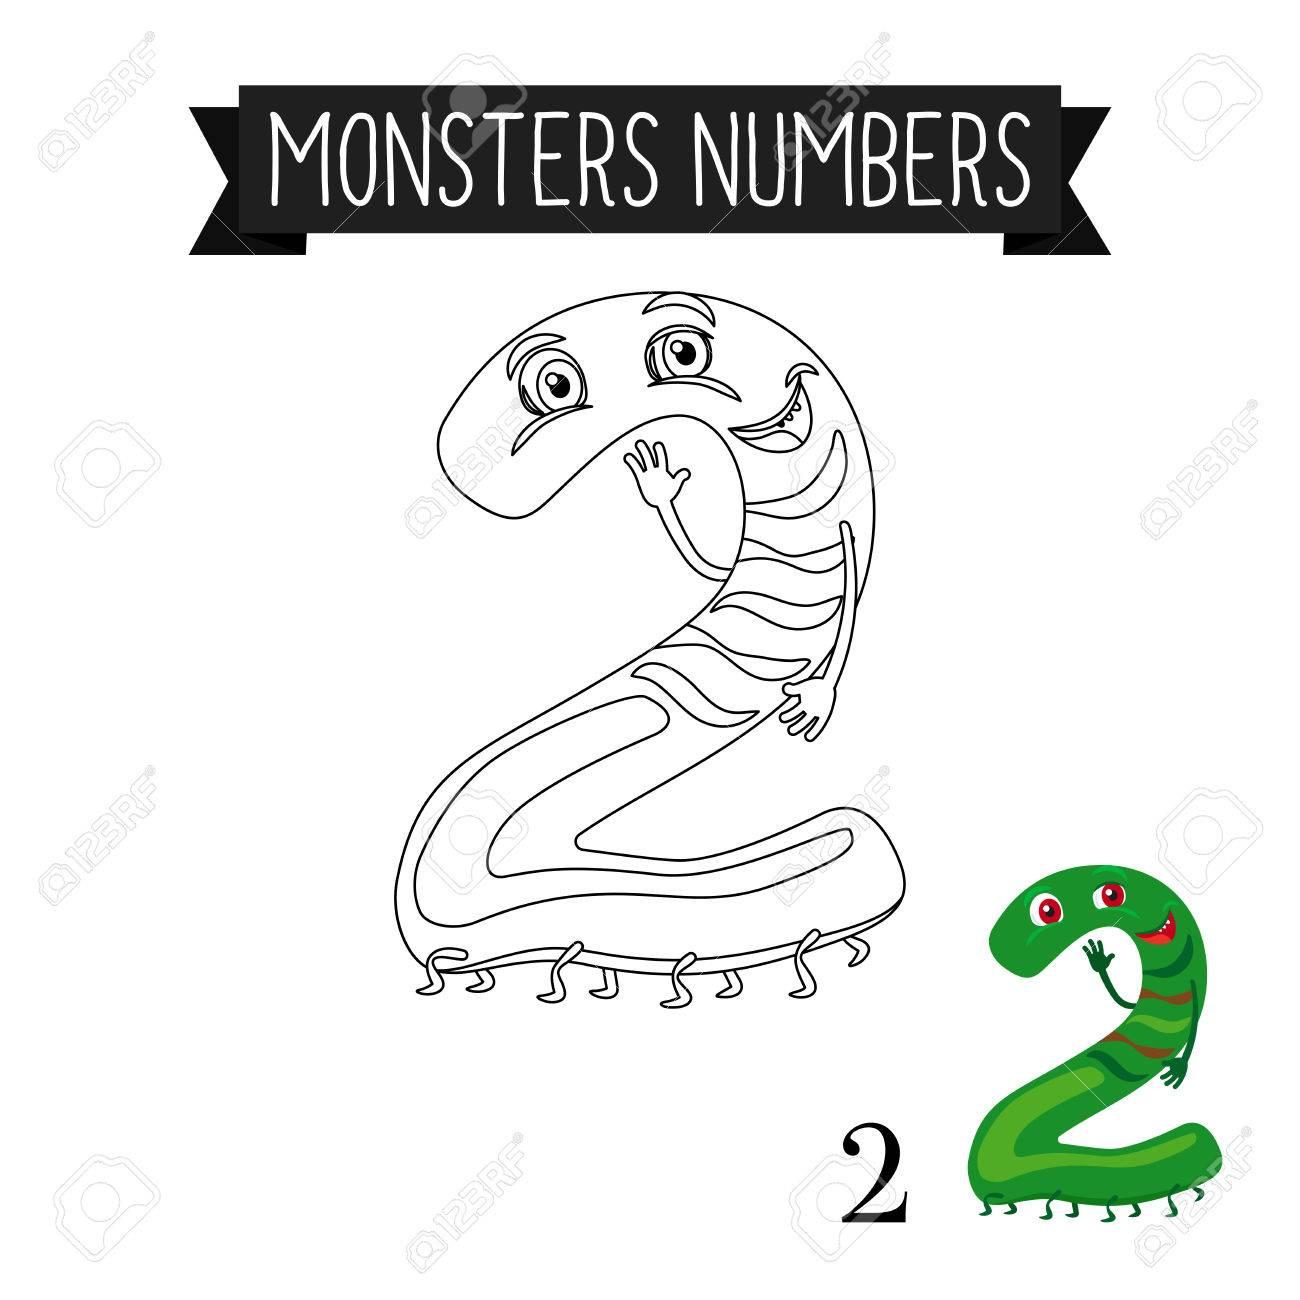 Malvorlage Monster Zahlen Für Kinder. Nummer 2 Vektor-Illustration ...